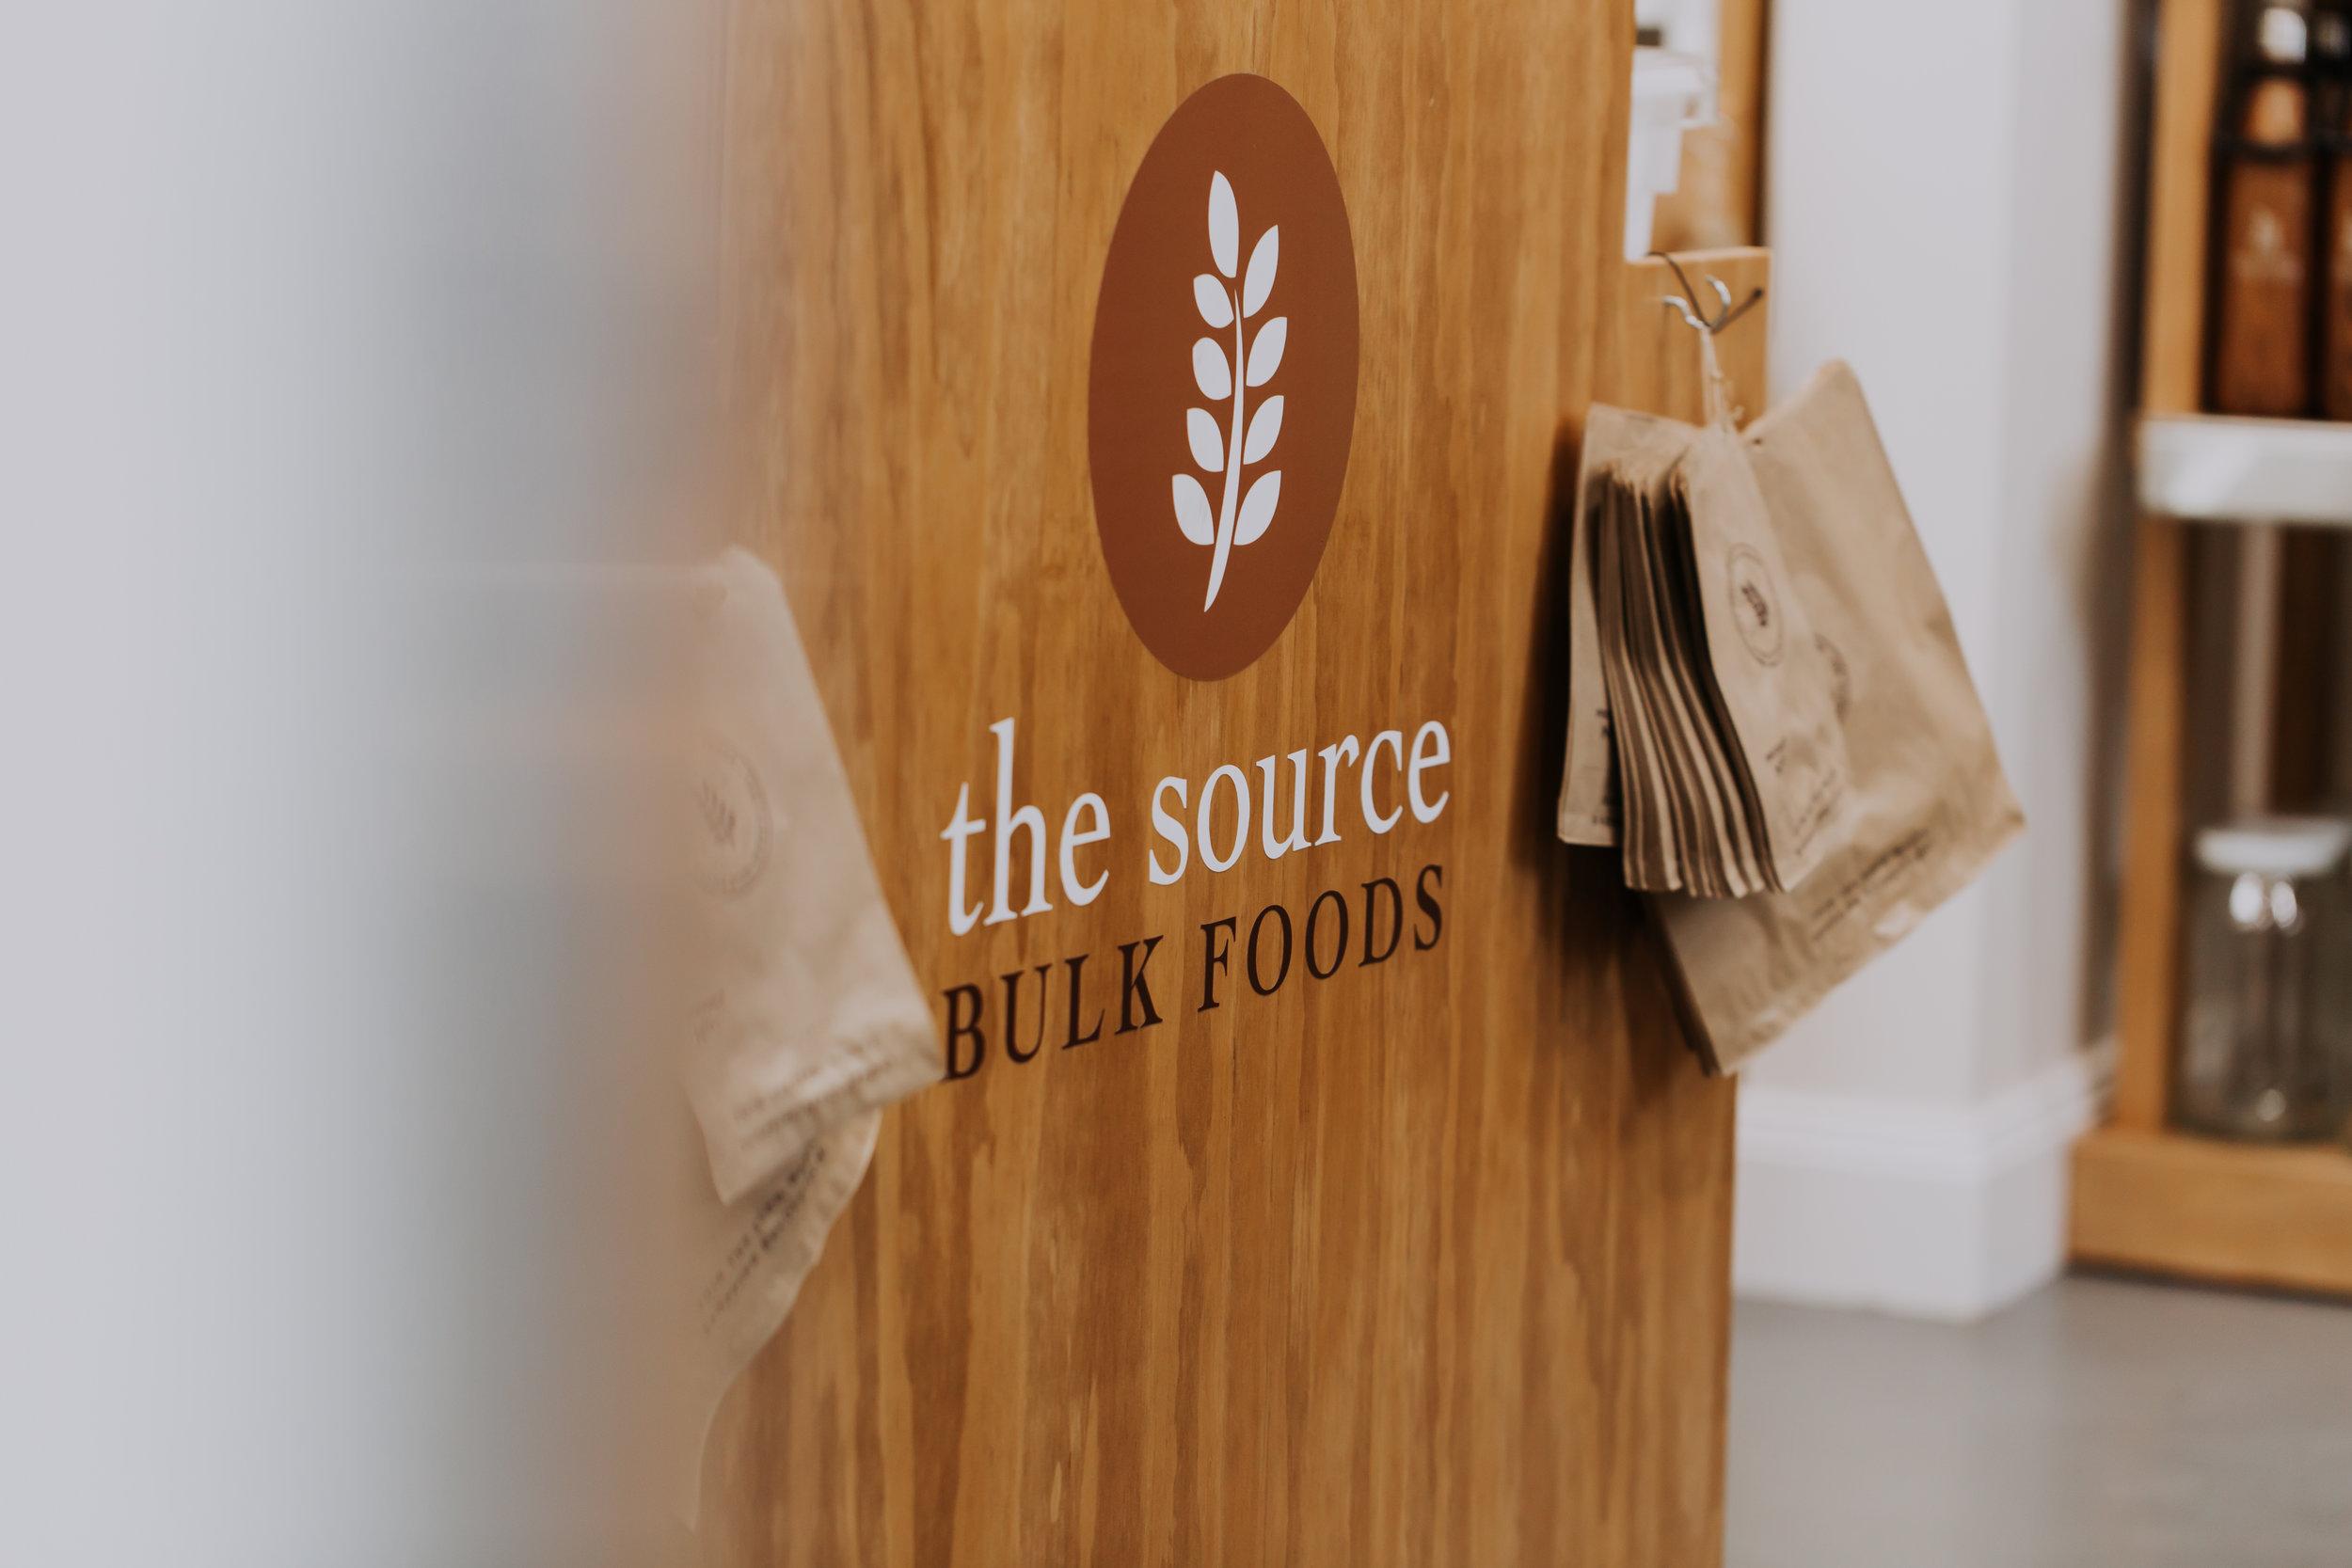 The Source Bulk Foods Wagga Wagga -